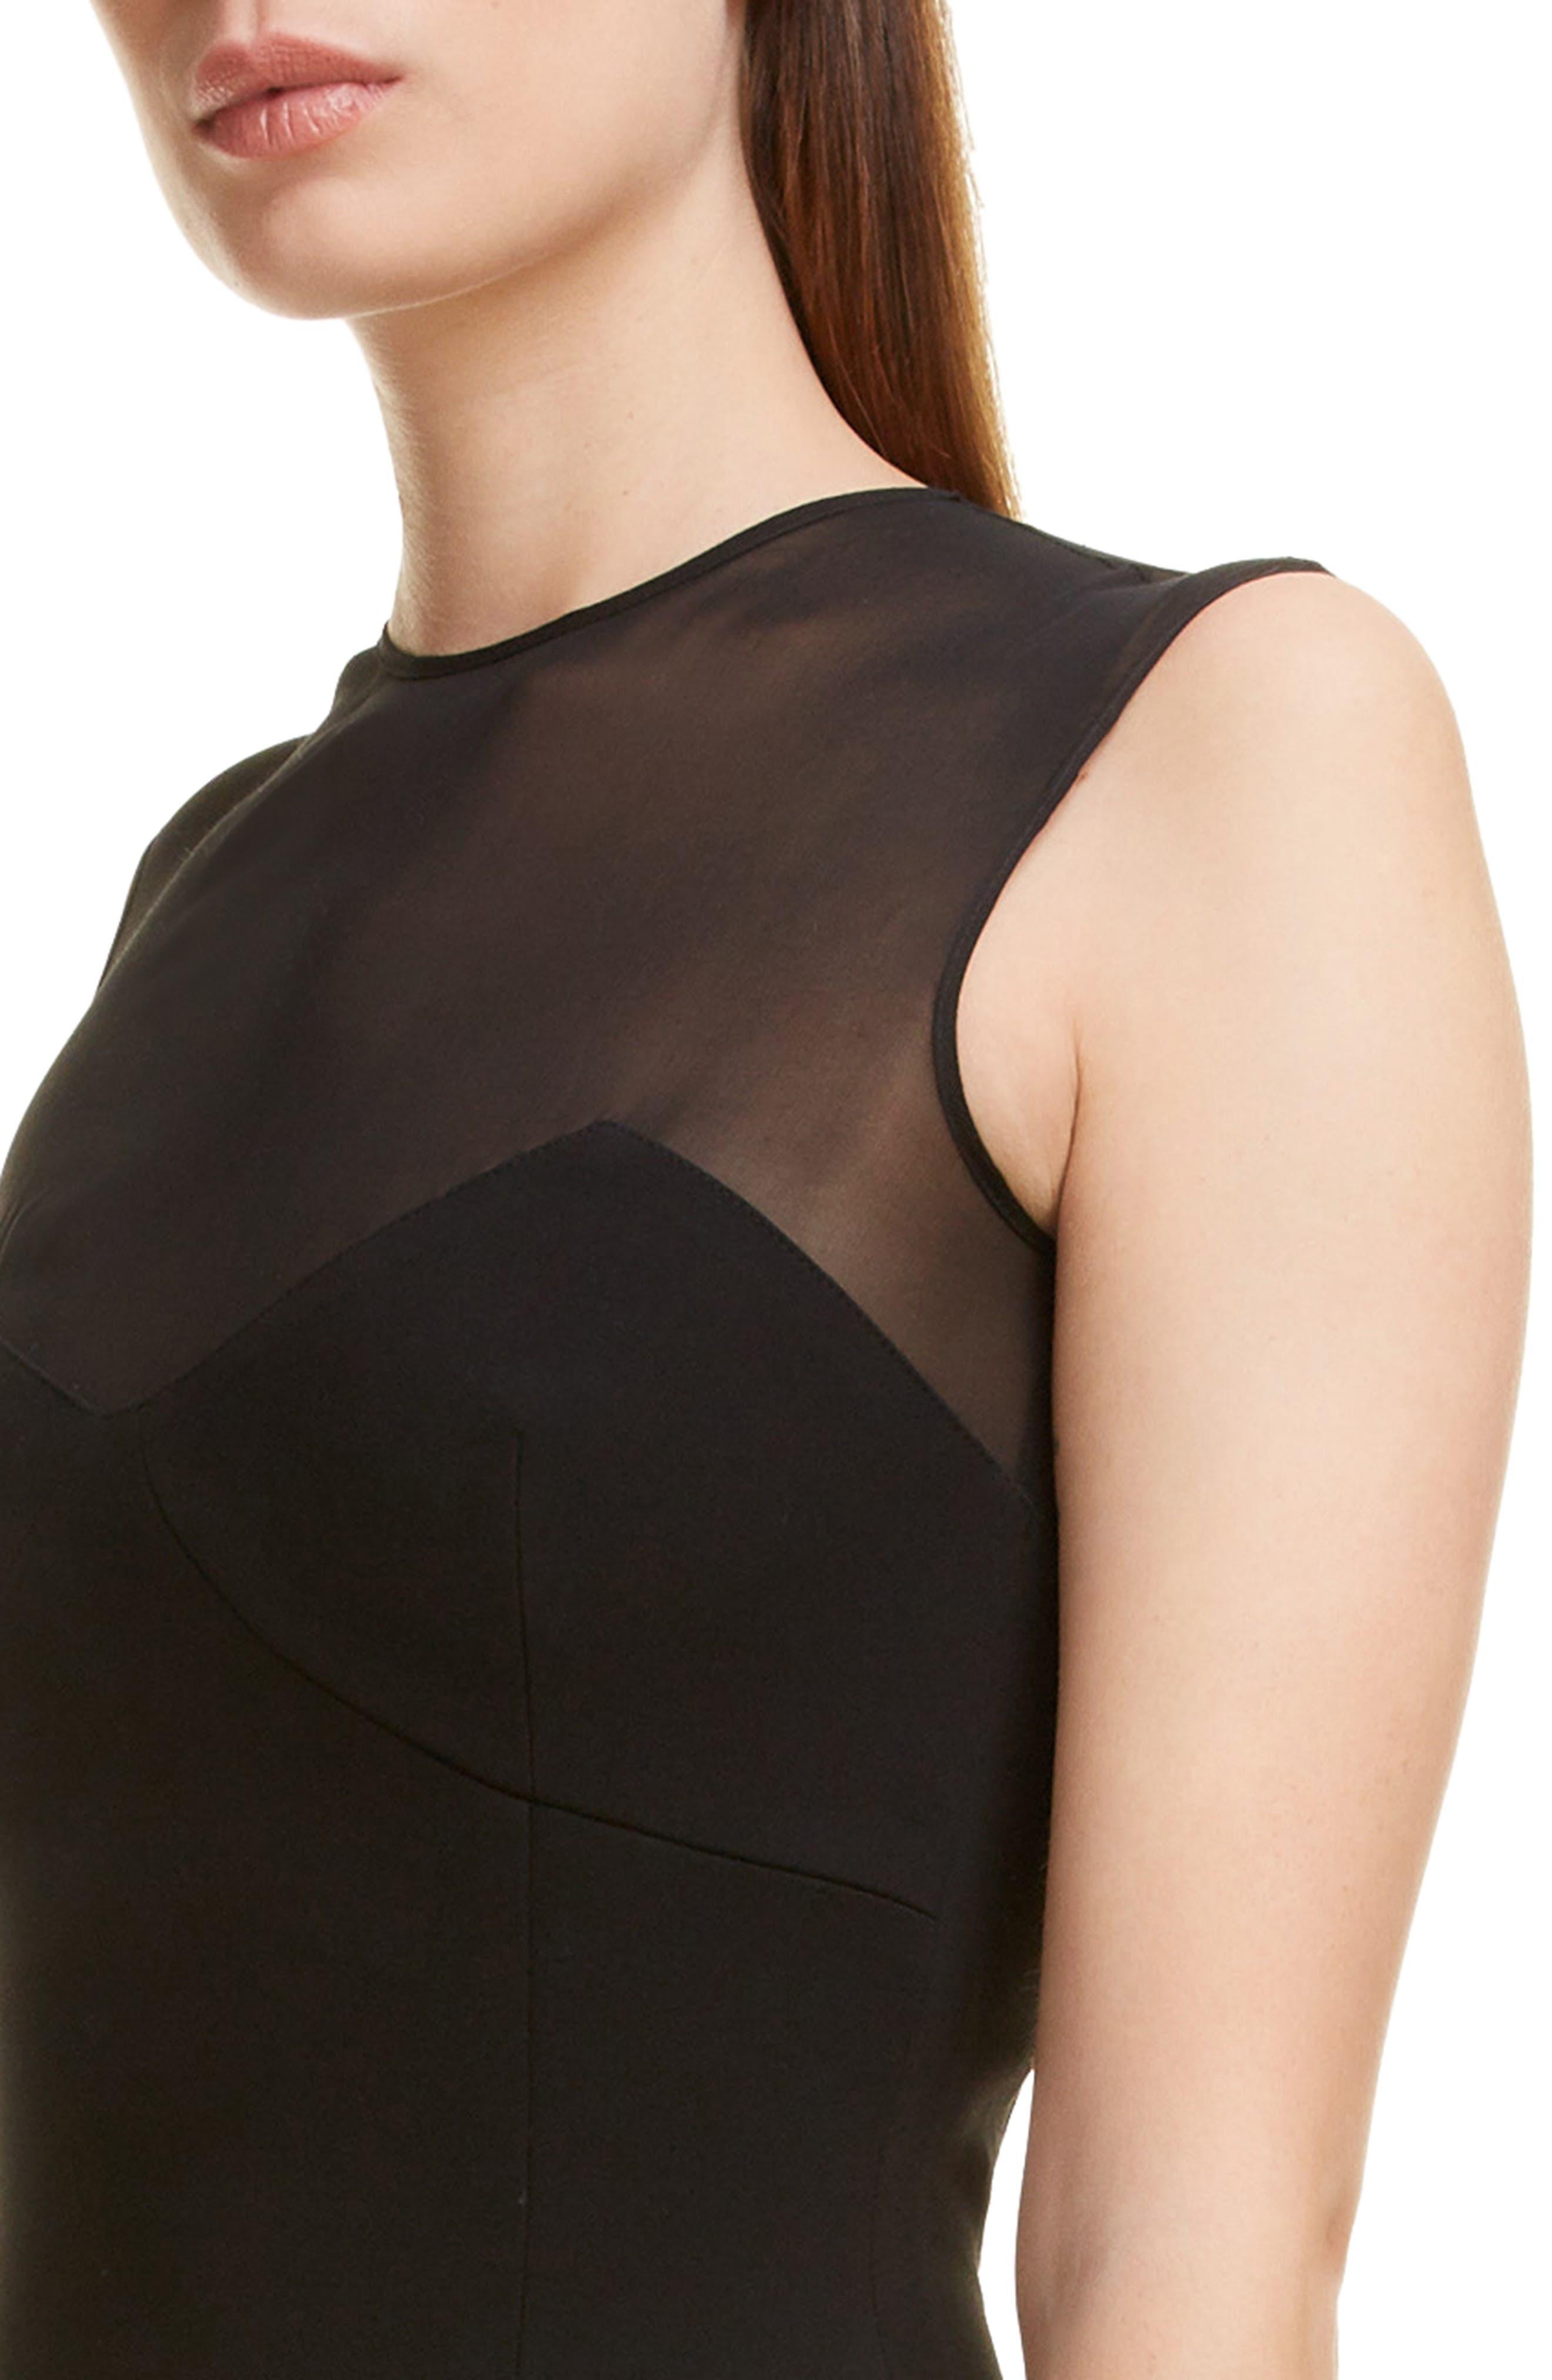 VICTORIA BECKHAM, Sheer Yoke Sheath Dress, Alternate thumbnail 4, color, BLACK